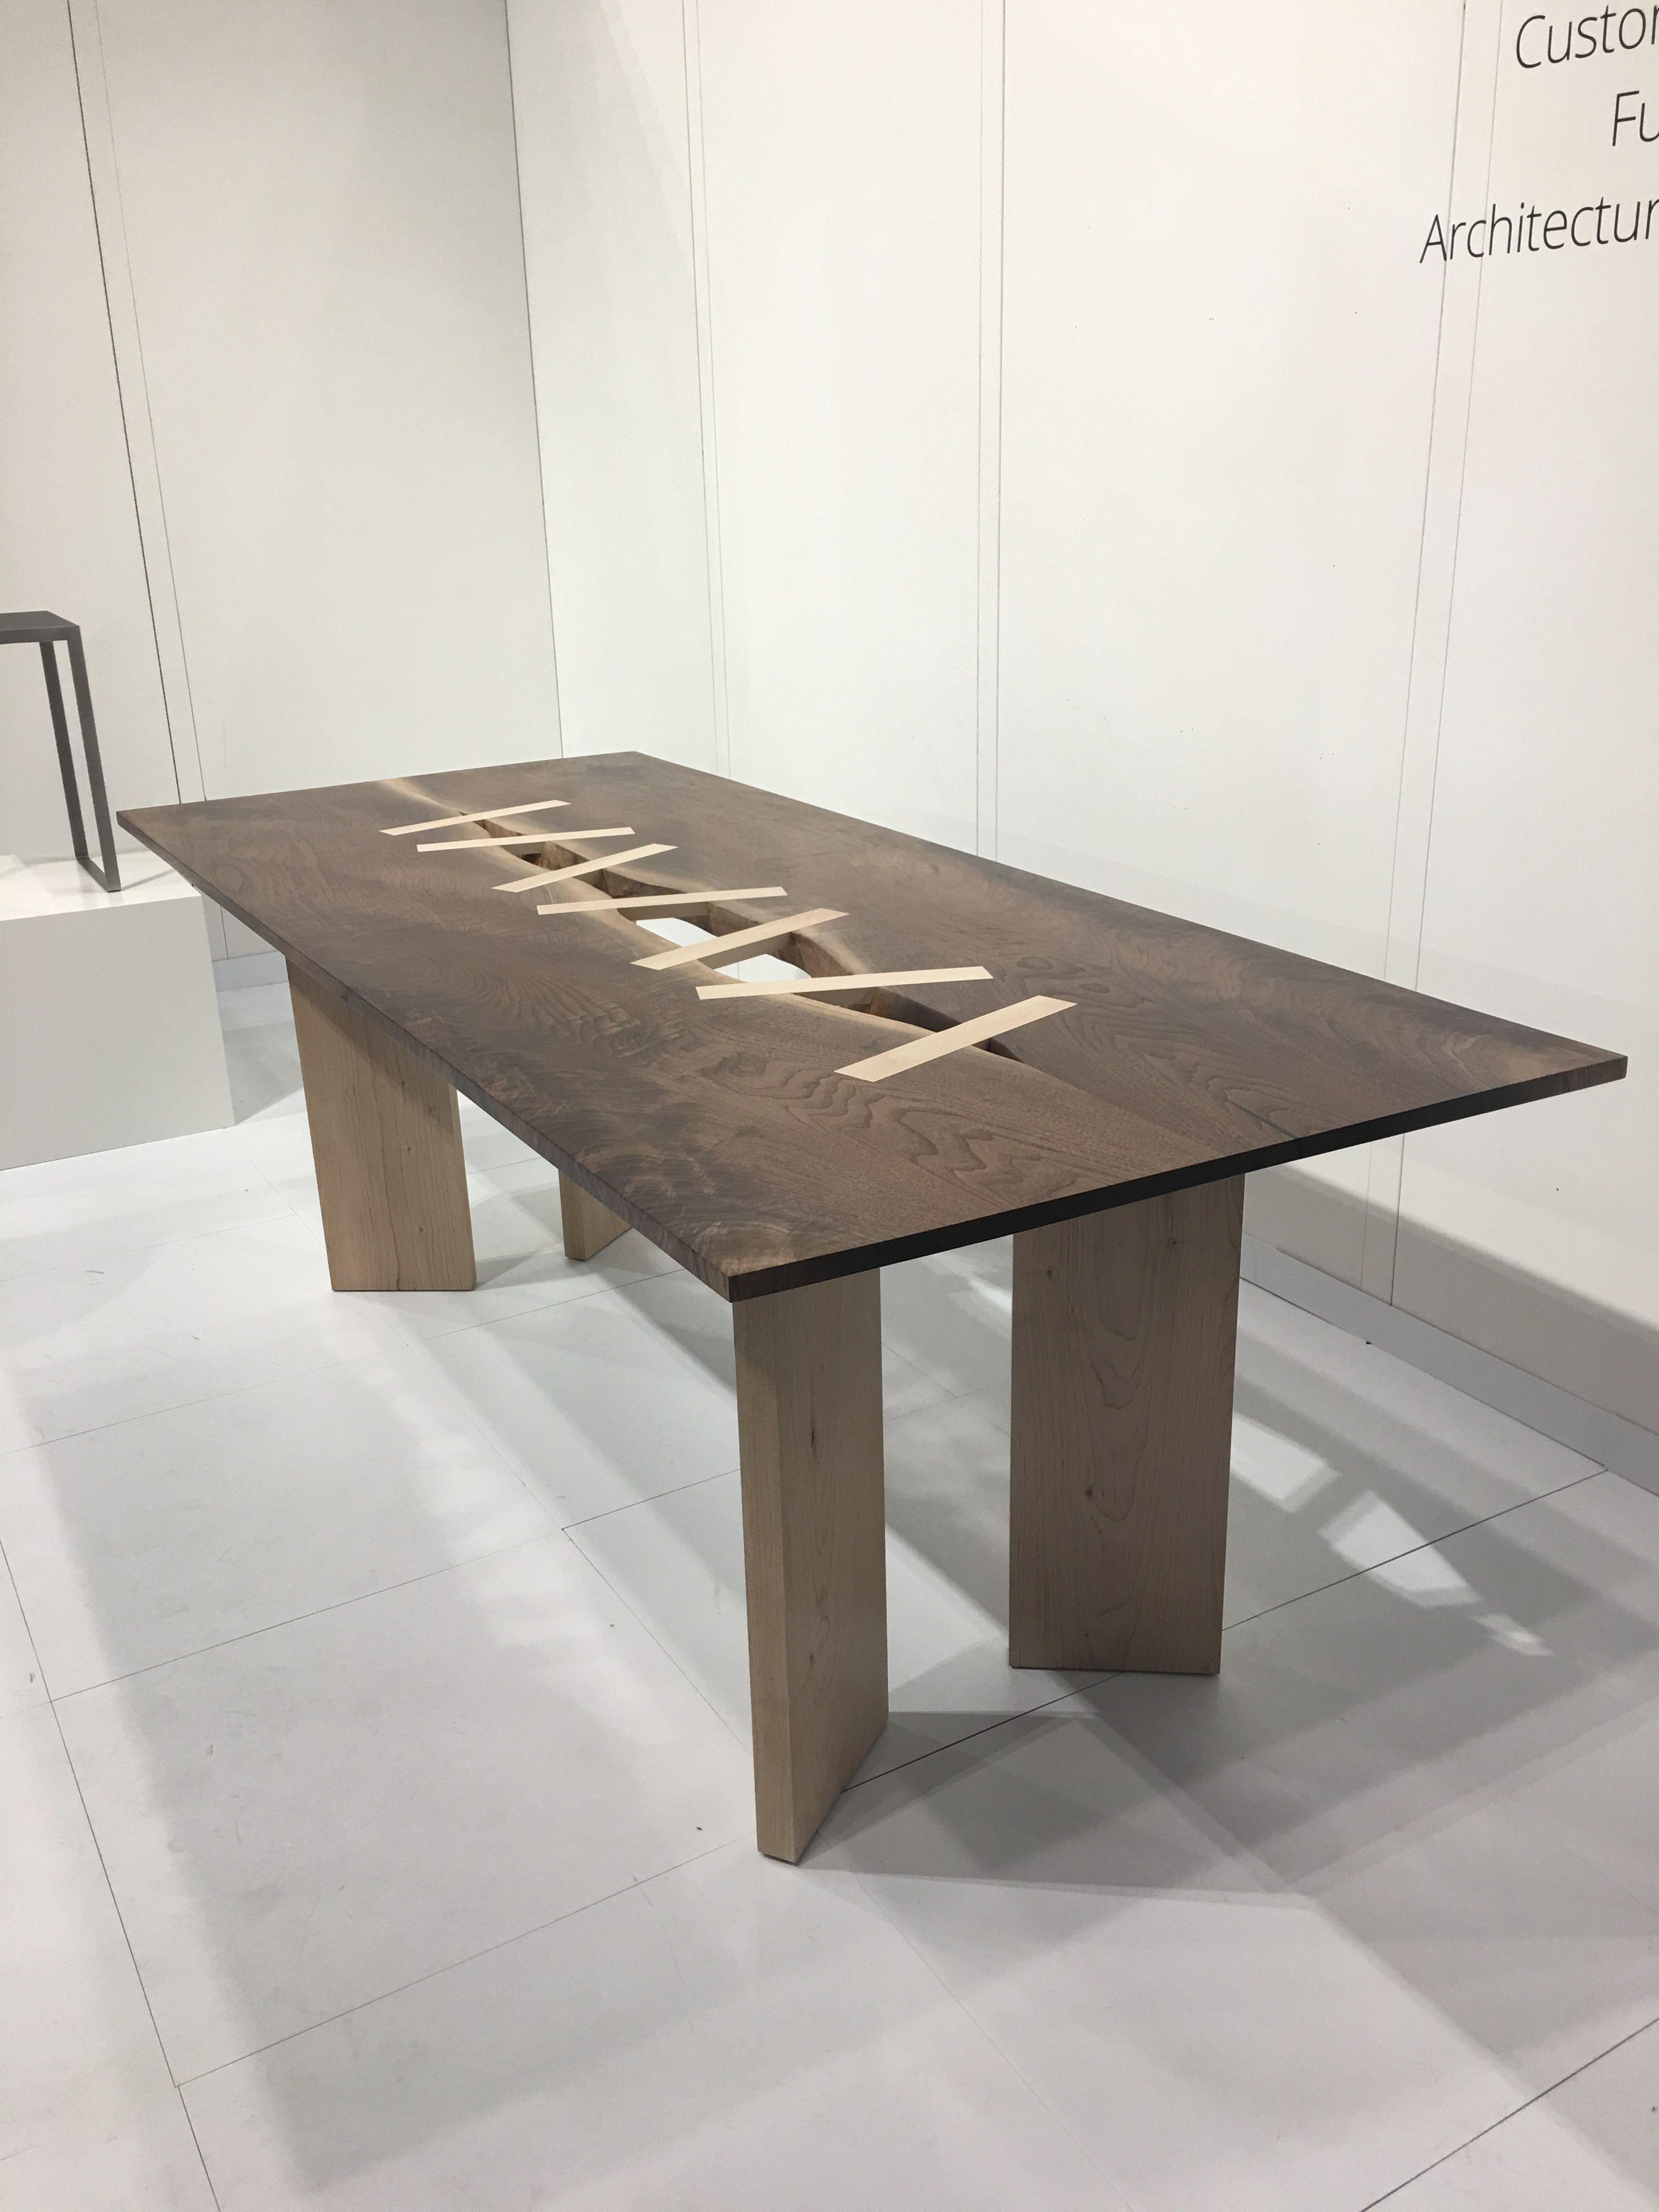 Anazao, custom ecological furniture from Canada, ICFF